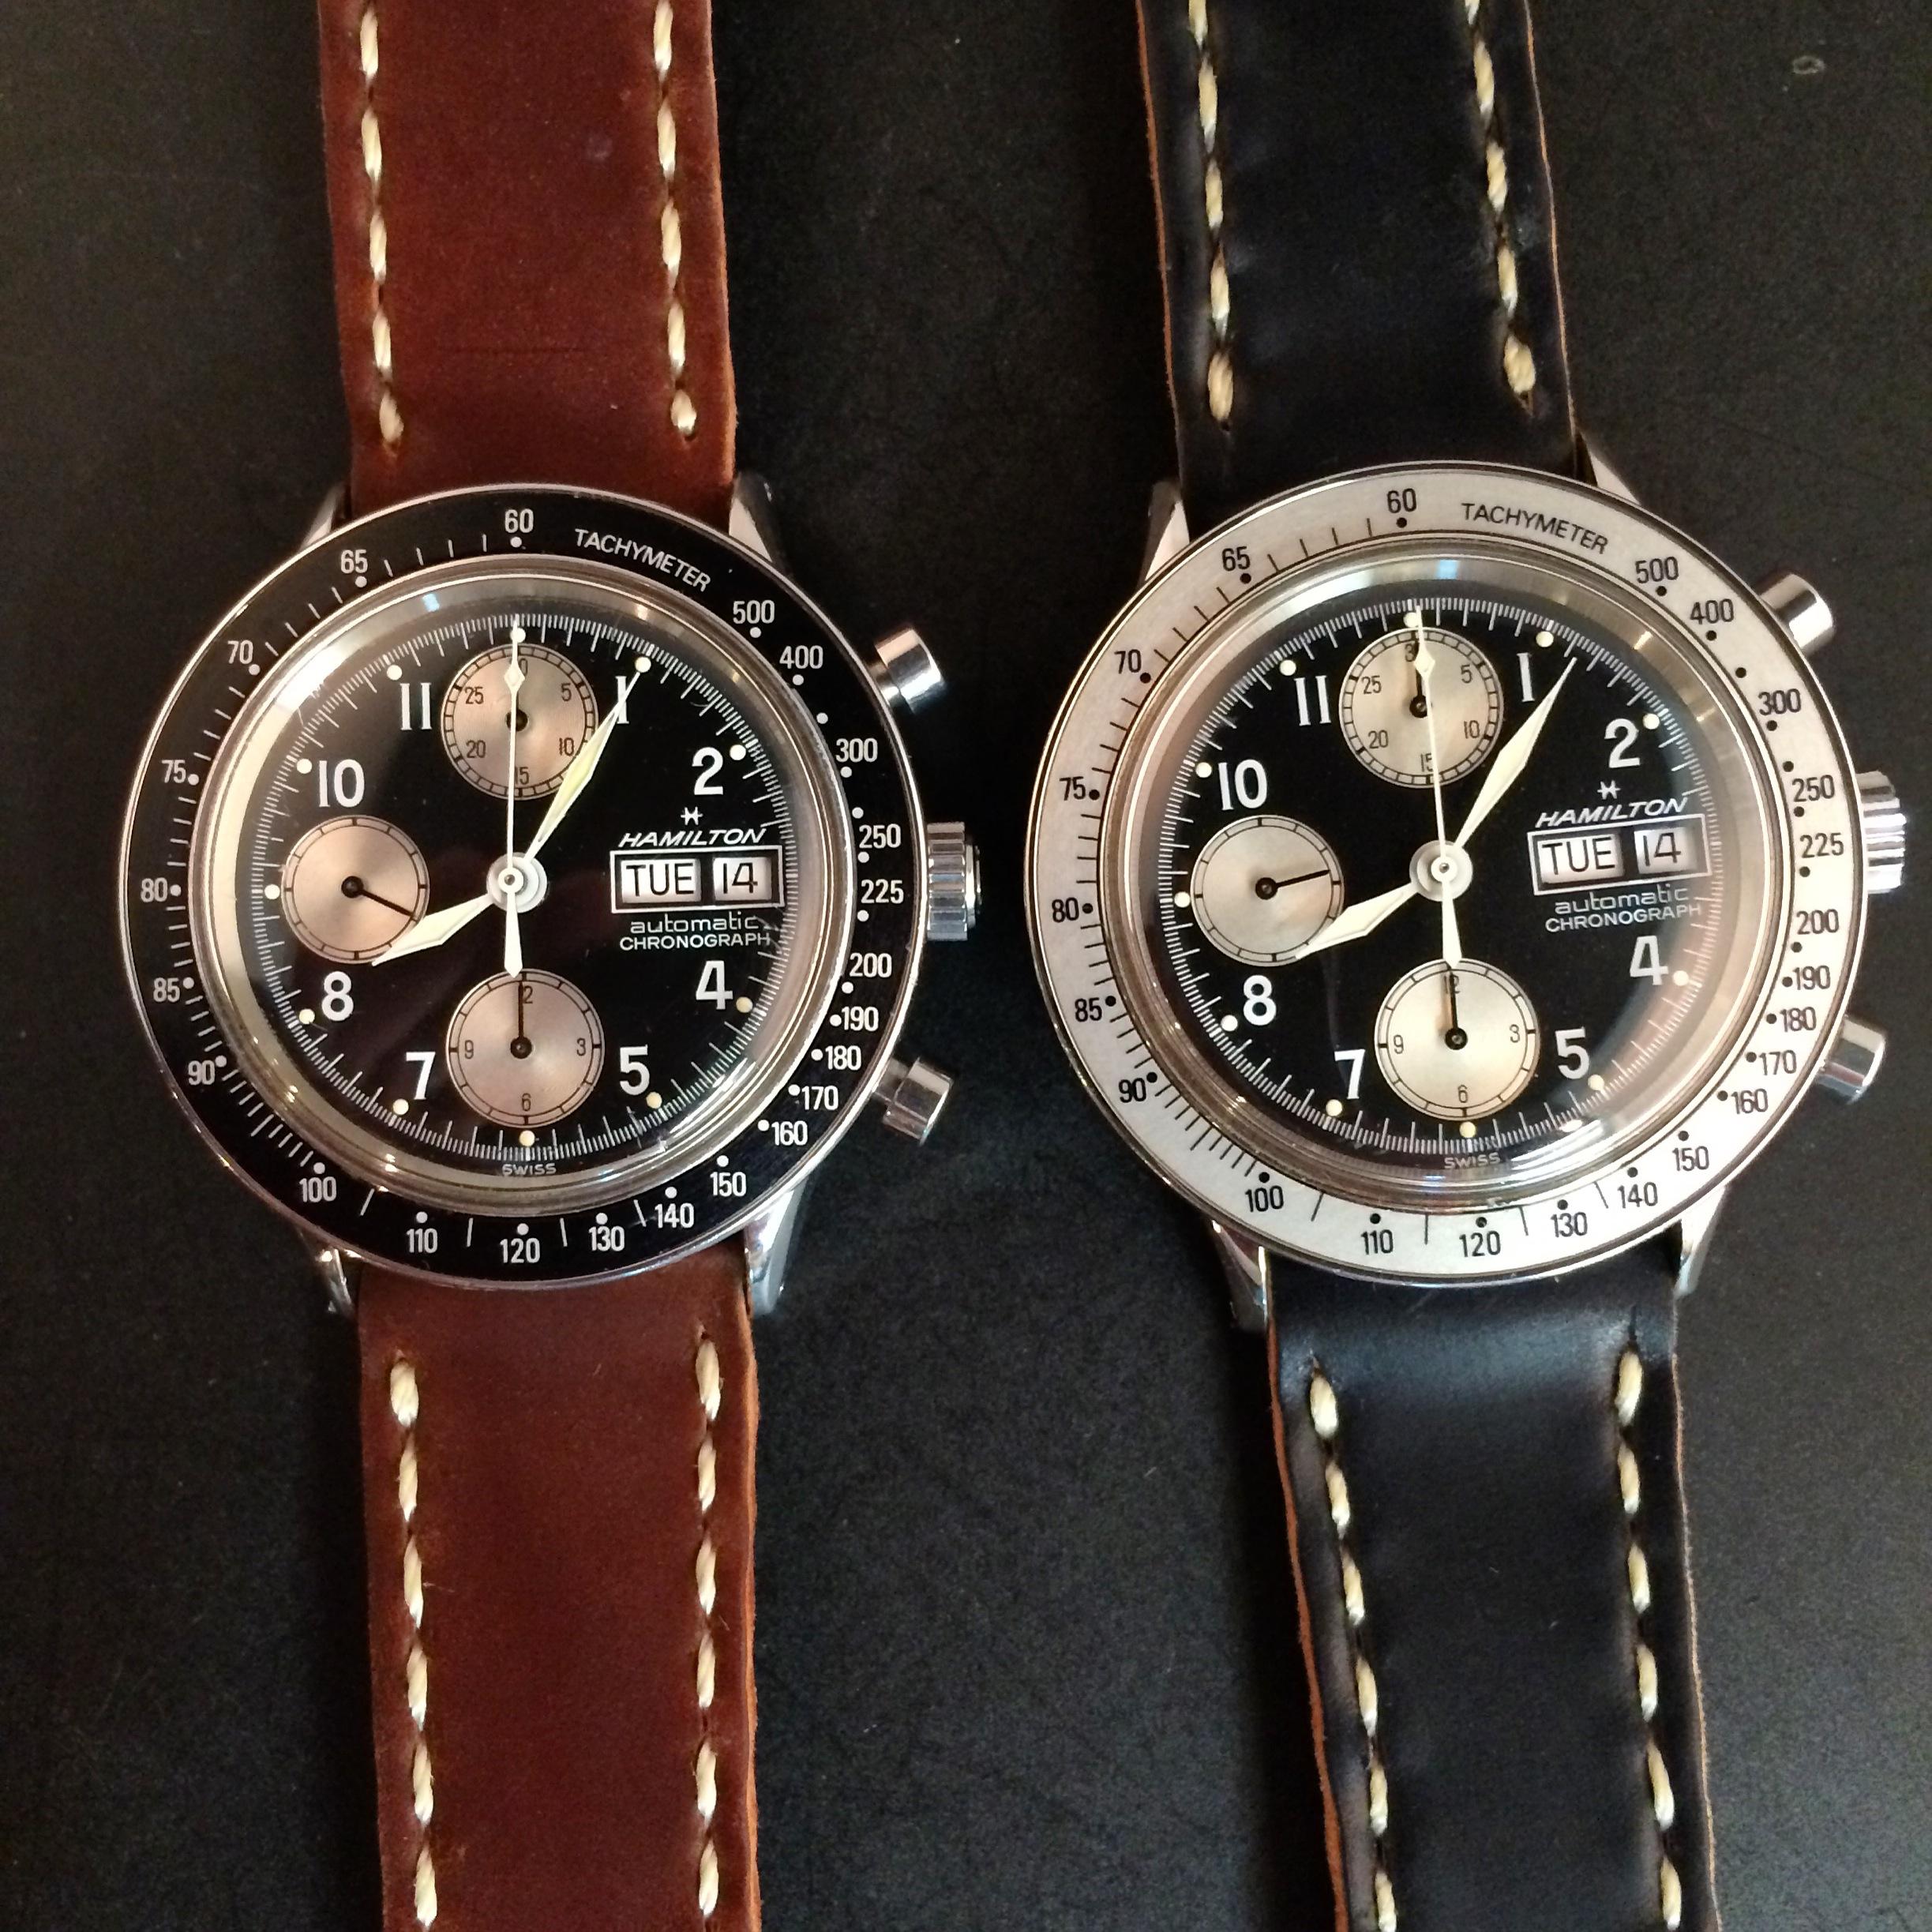 Hamilton reference 9379 chronographs.